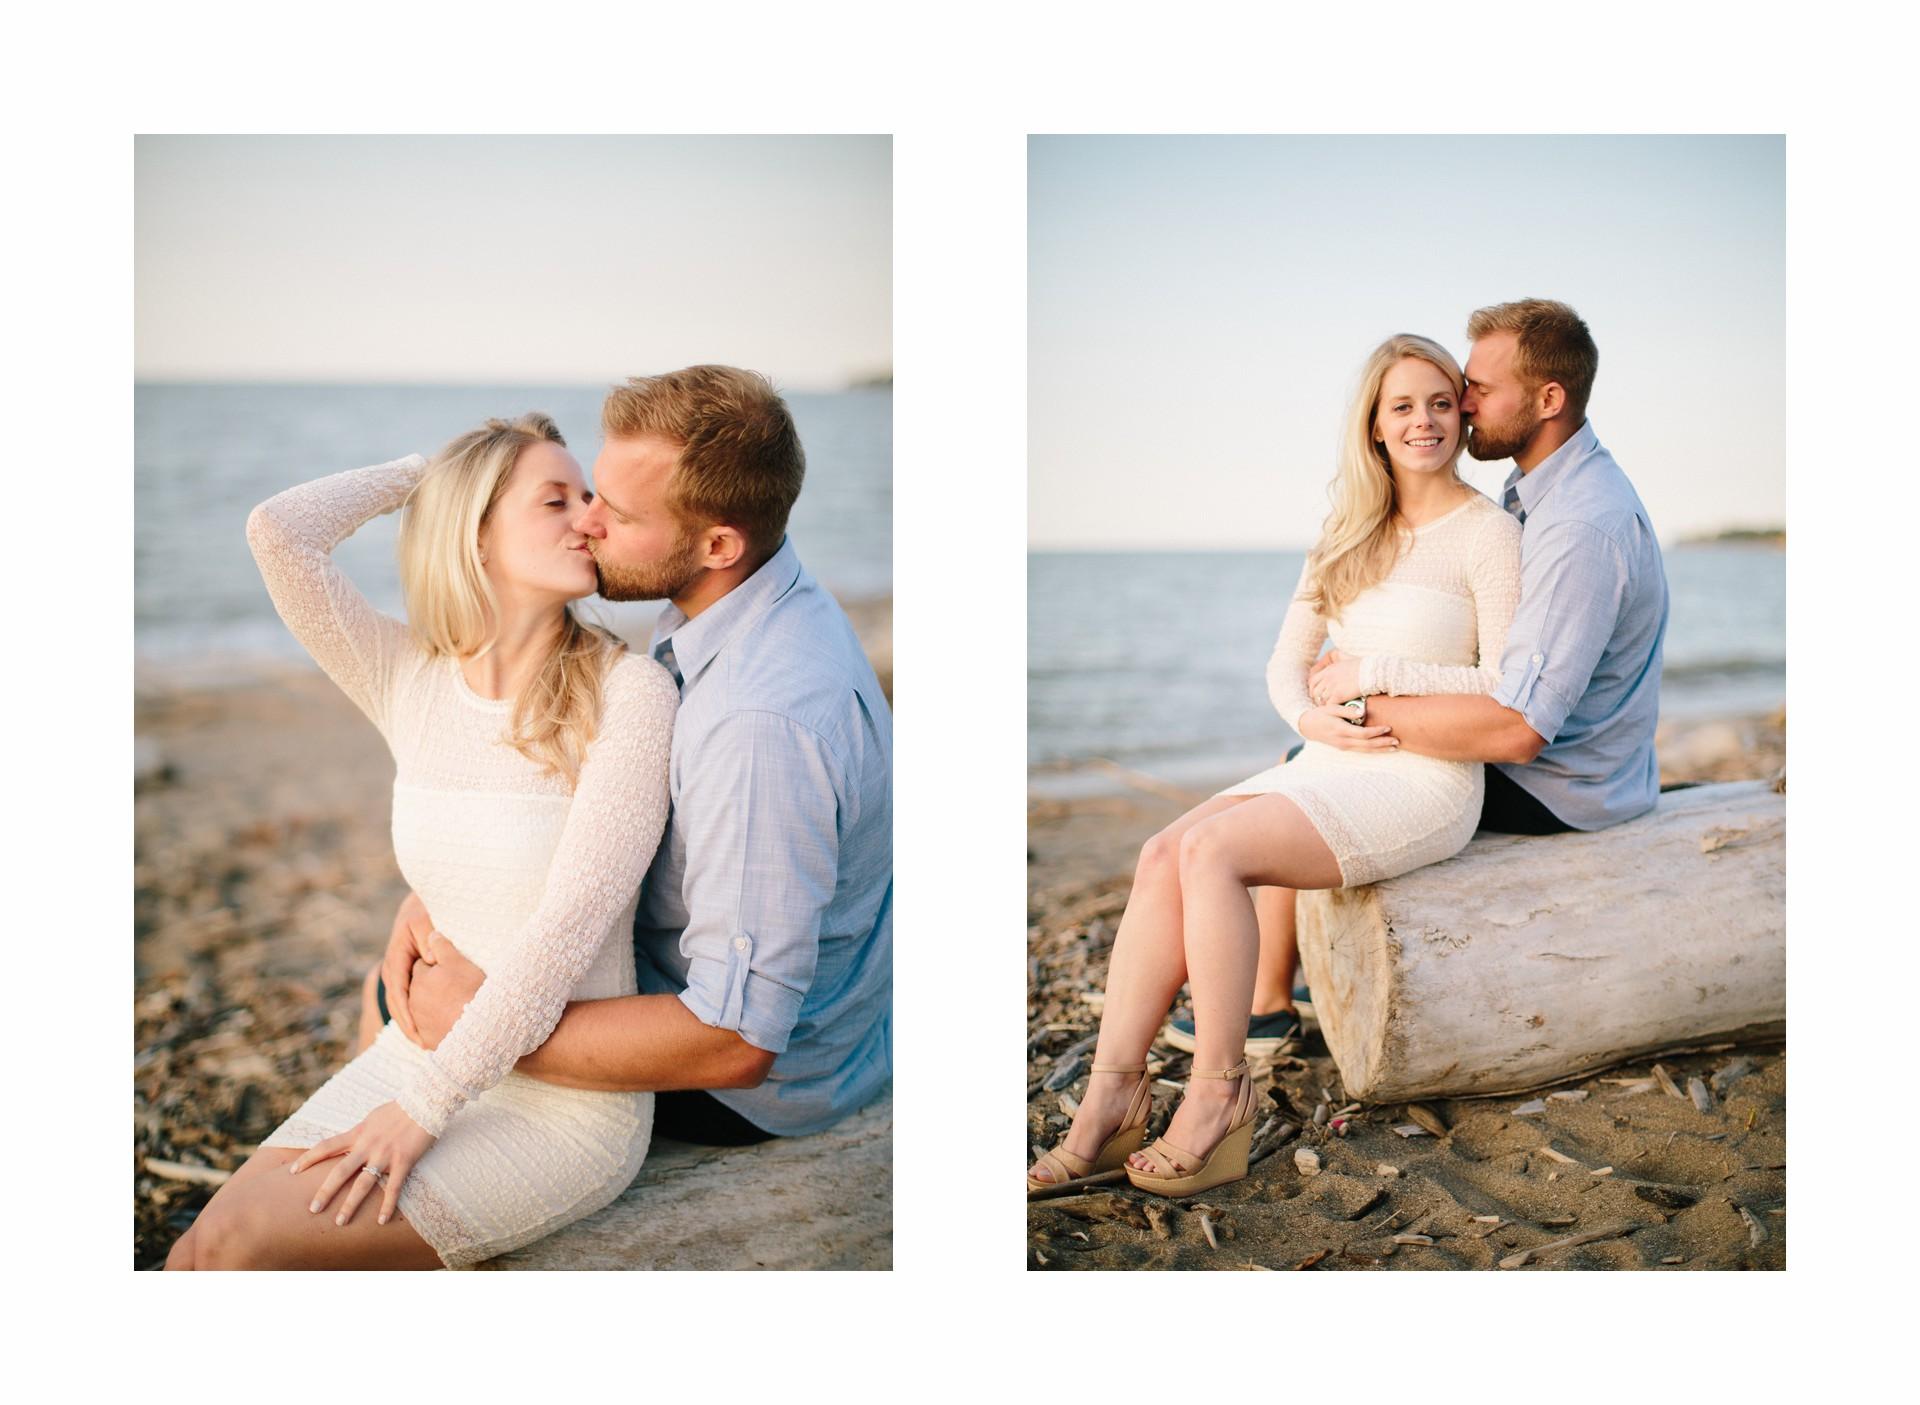 Cleveland Wedding and Engagement Photos 6.jpg